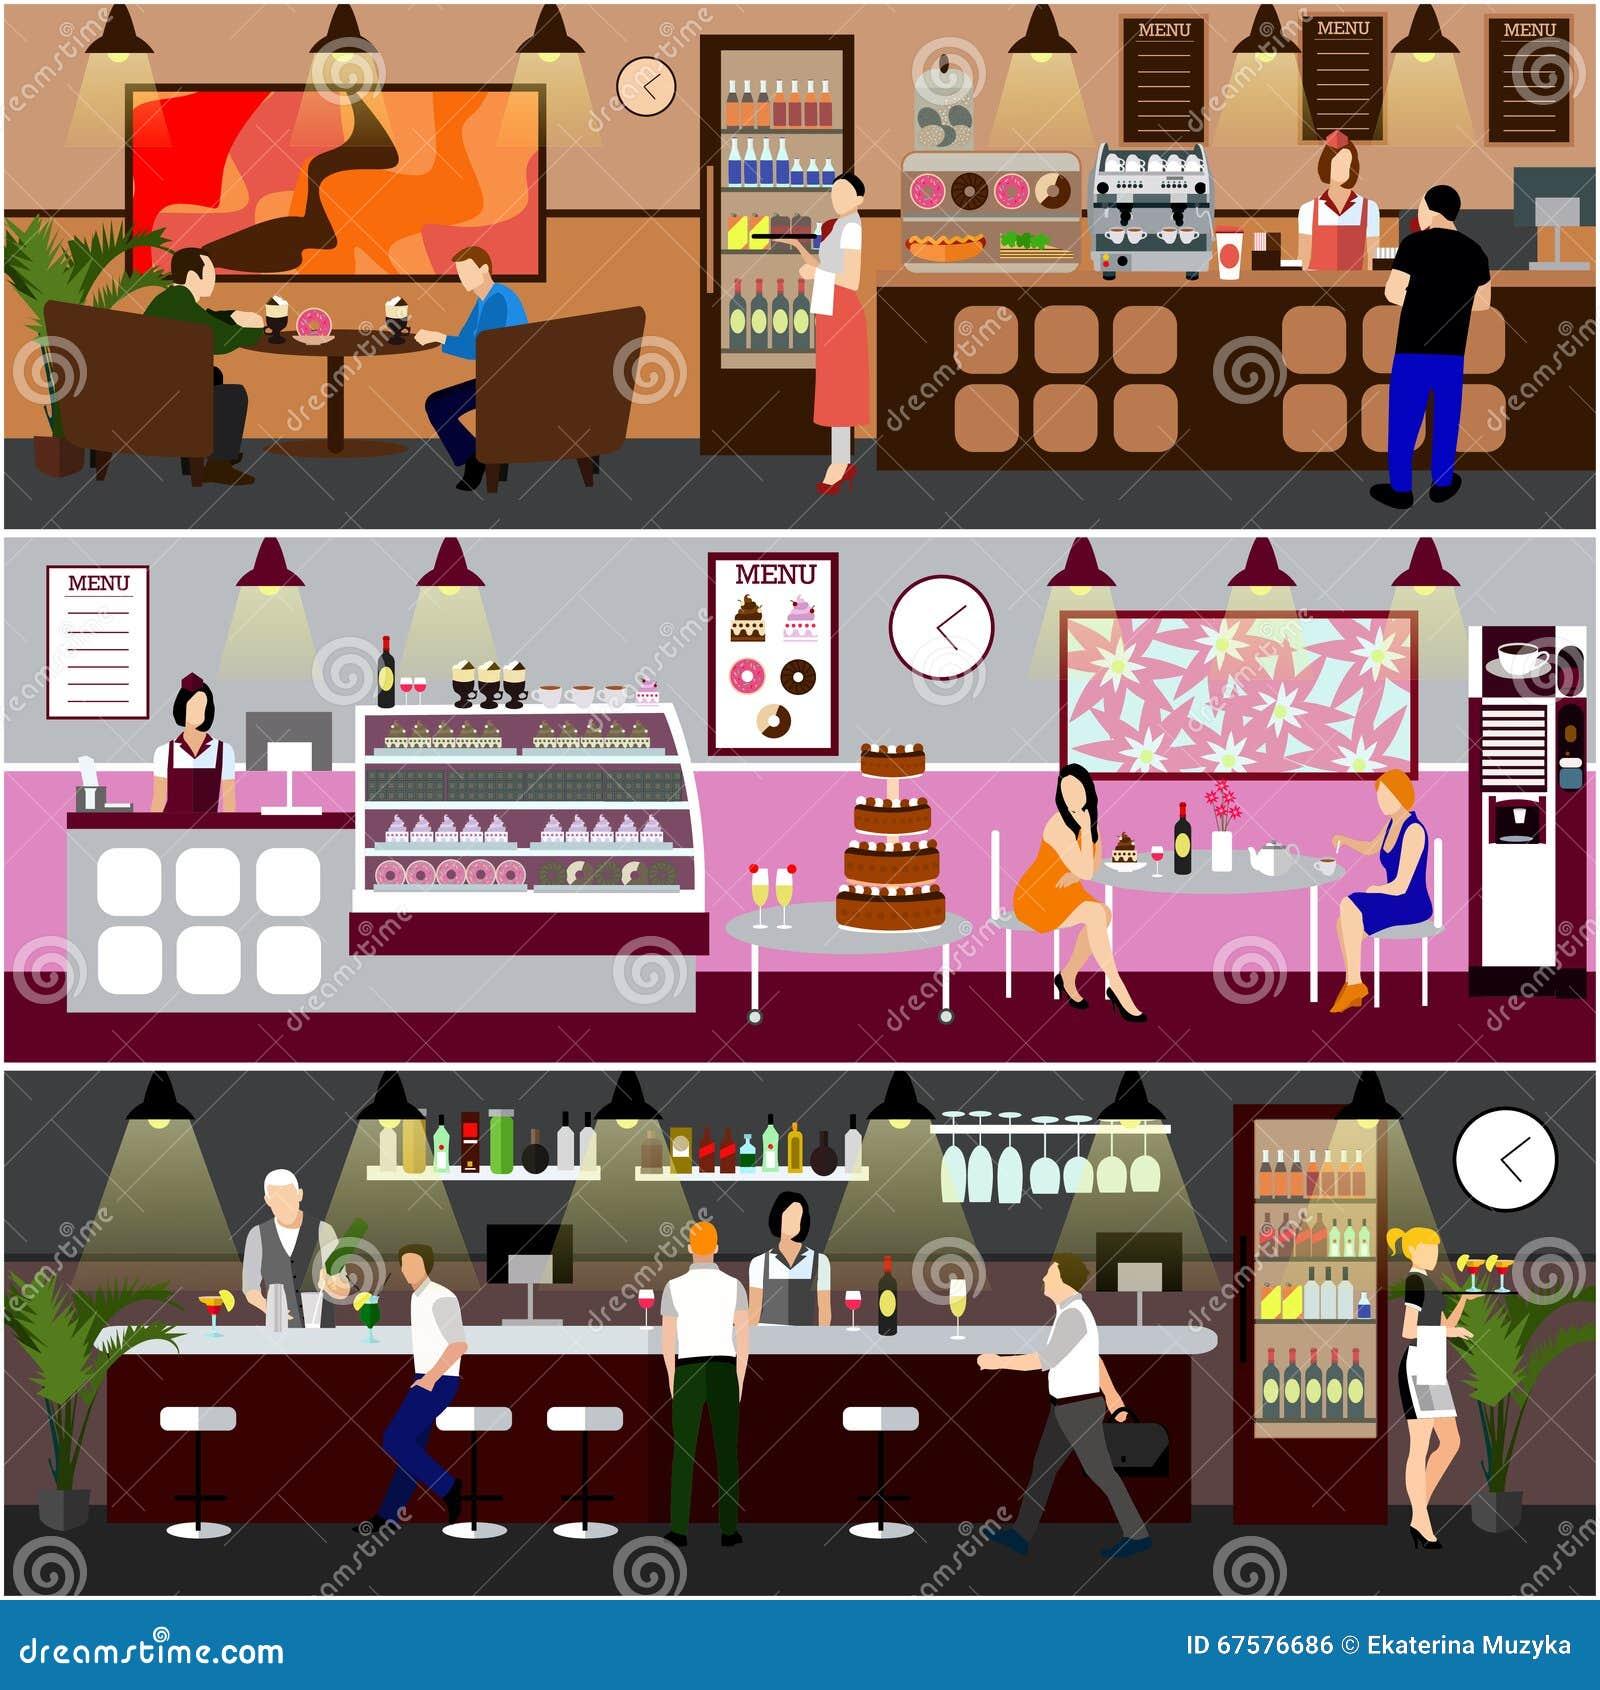 Cafe Interior Vector Illustration Design Of Coffee Shop